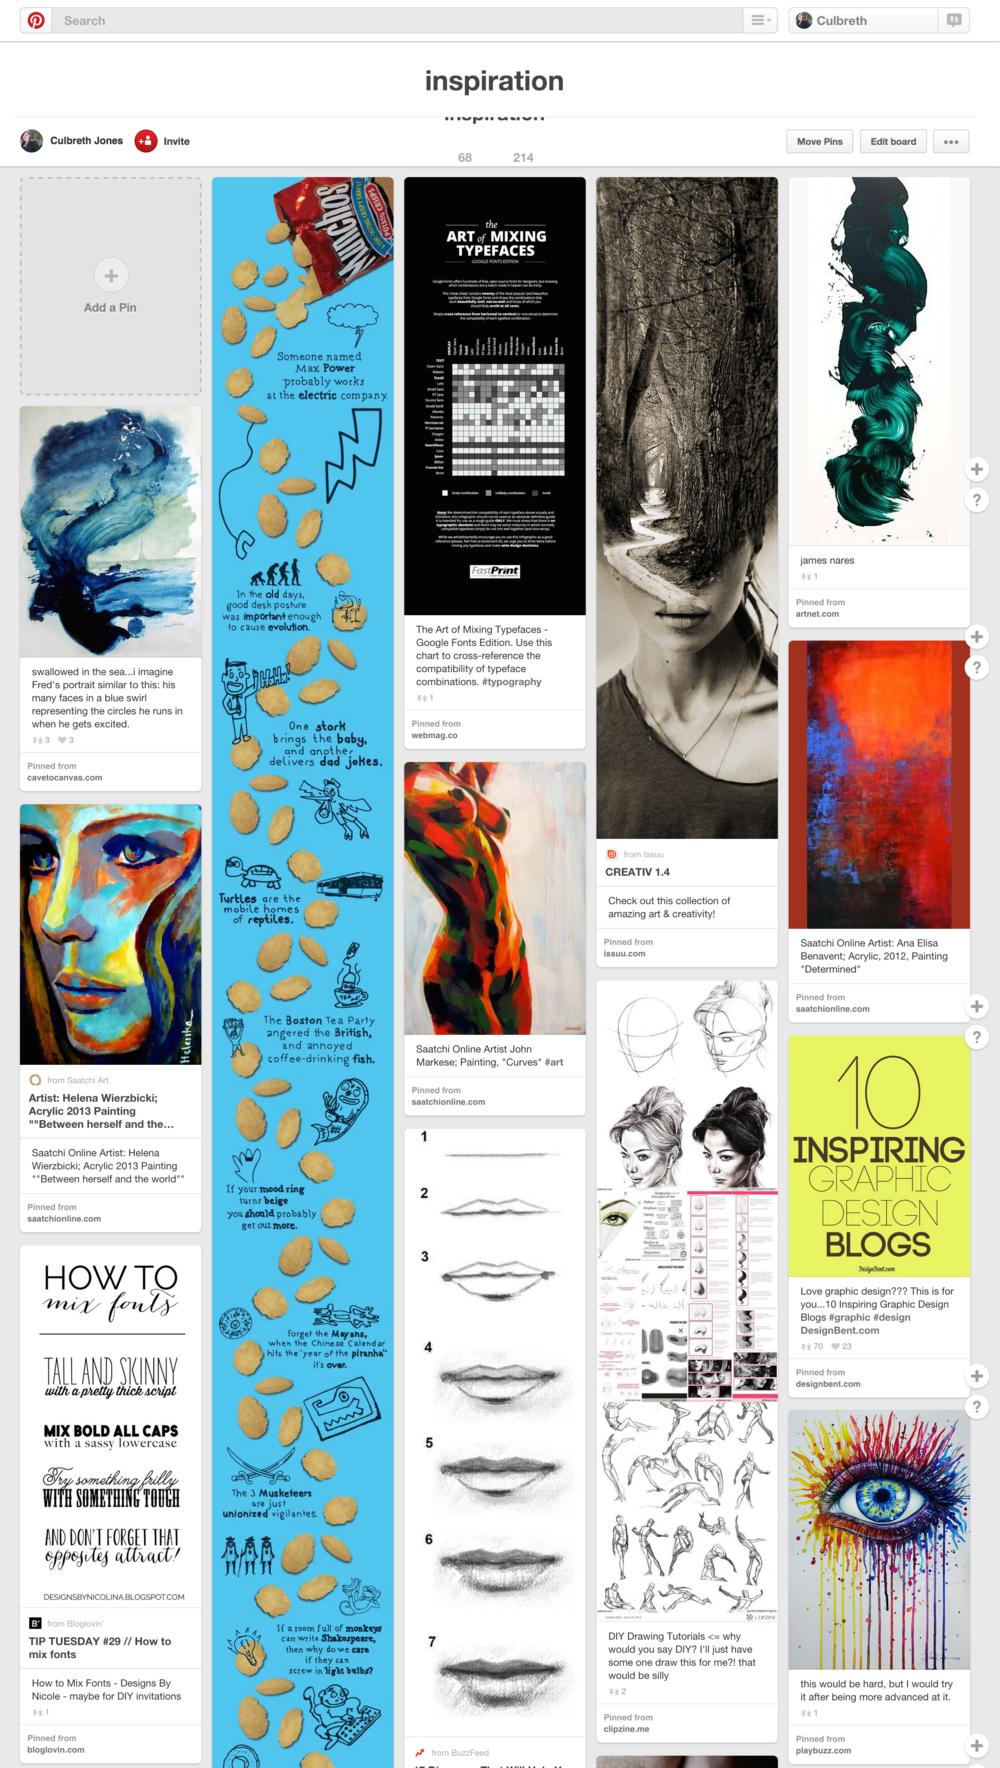 screencapture-www-pinterest-com-jonescg1-inspiration-1438753847508 copy1.png